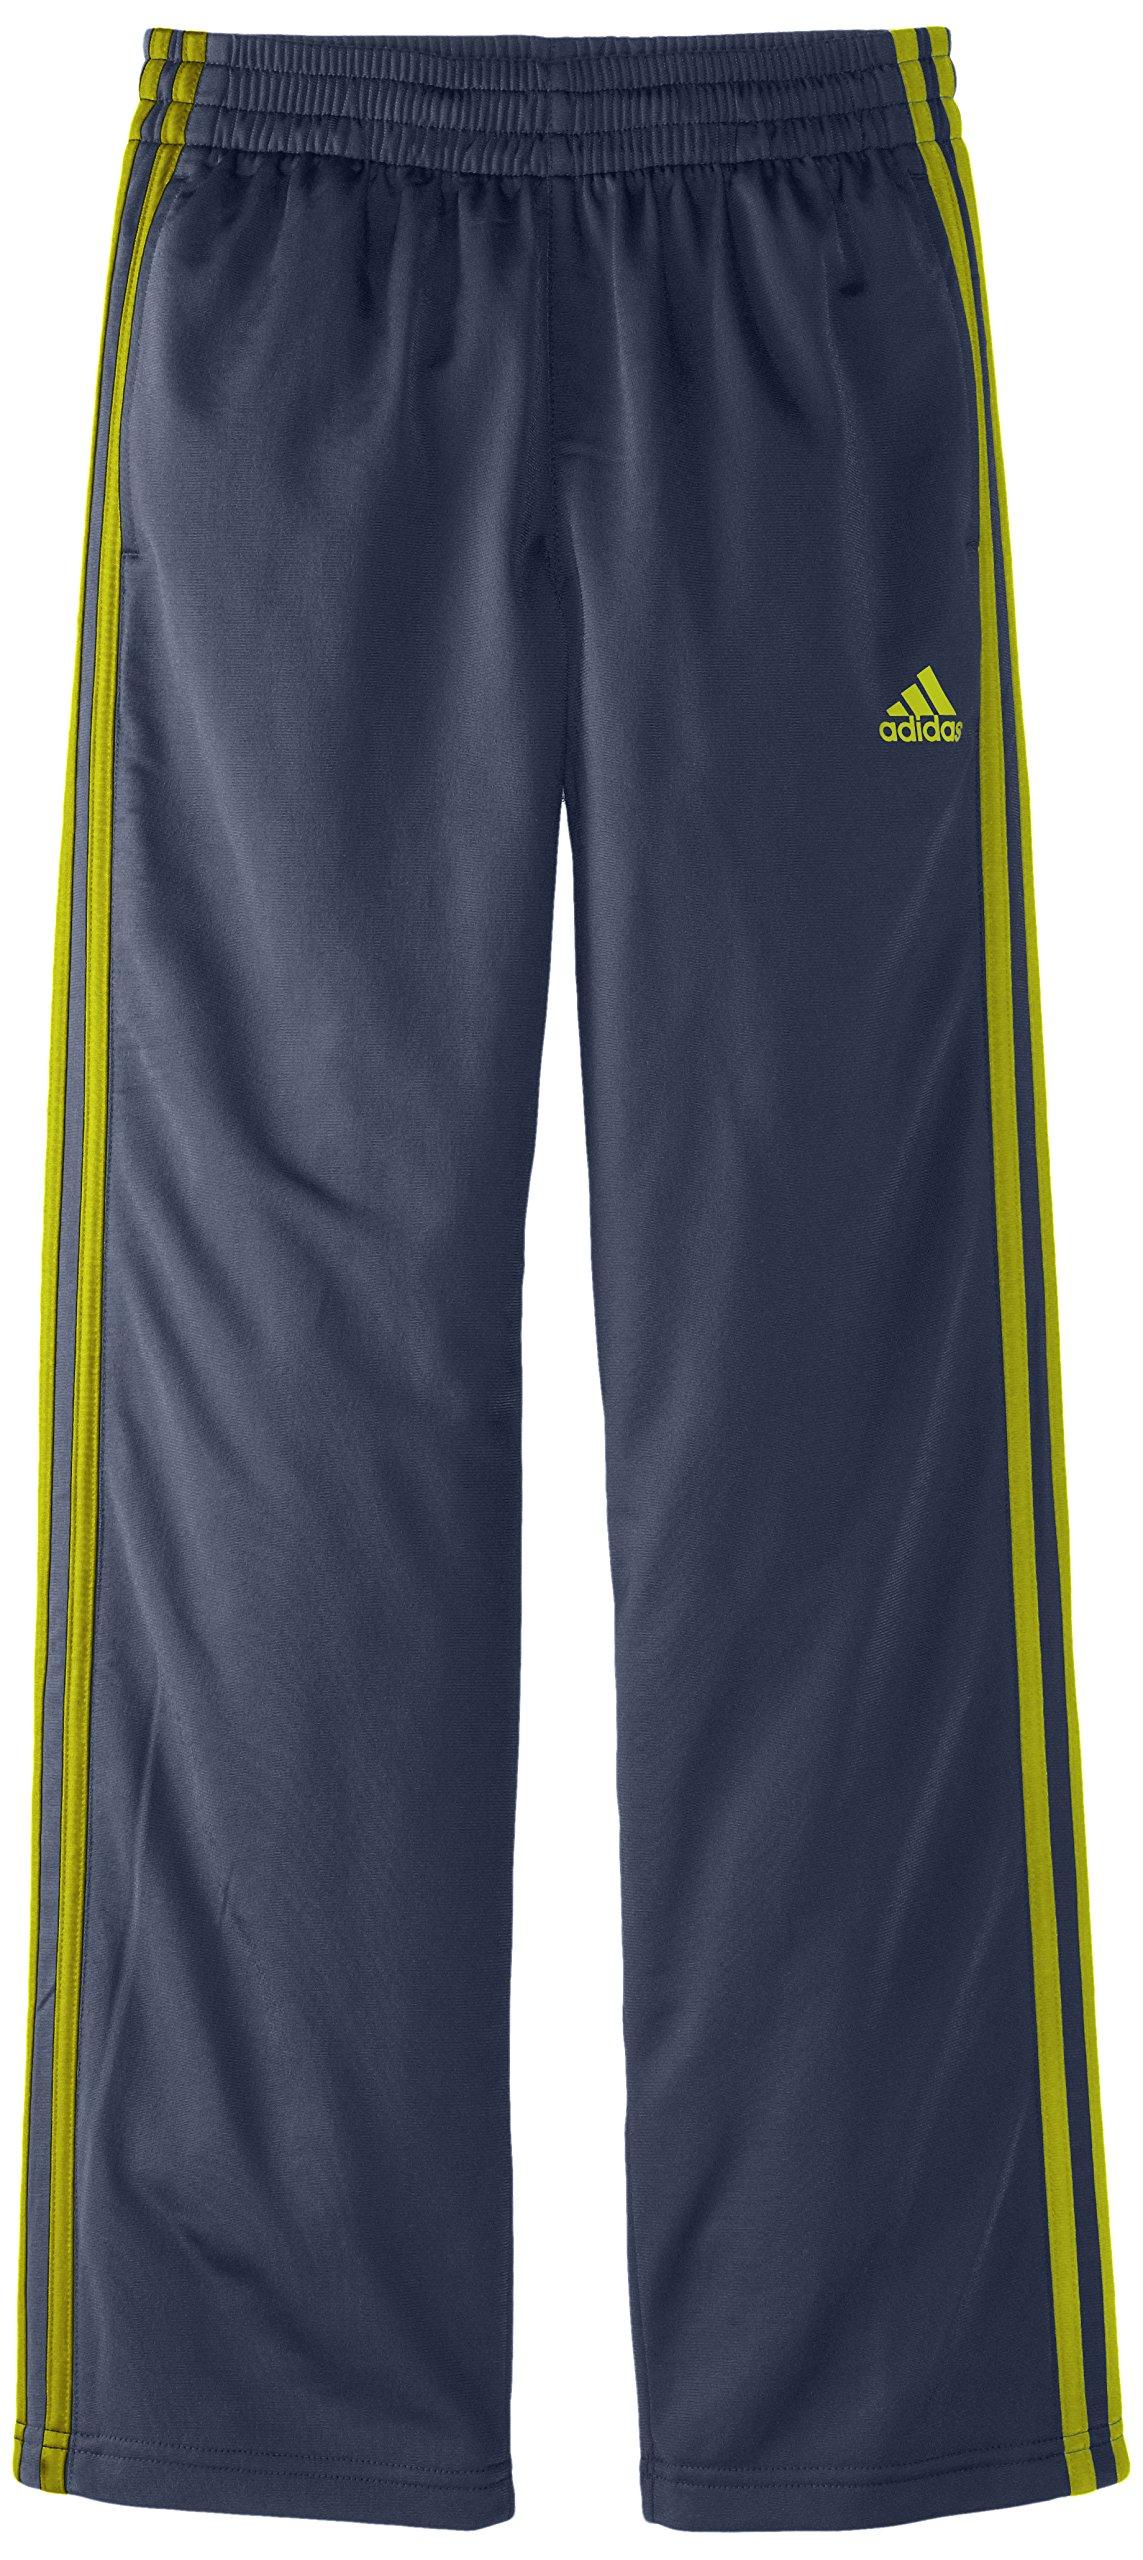 adidas Big Boys' Designator Pant, Grey/Yellow, X-Large